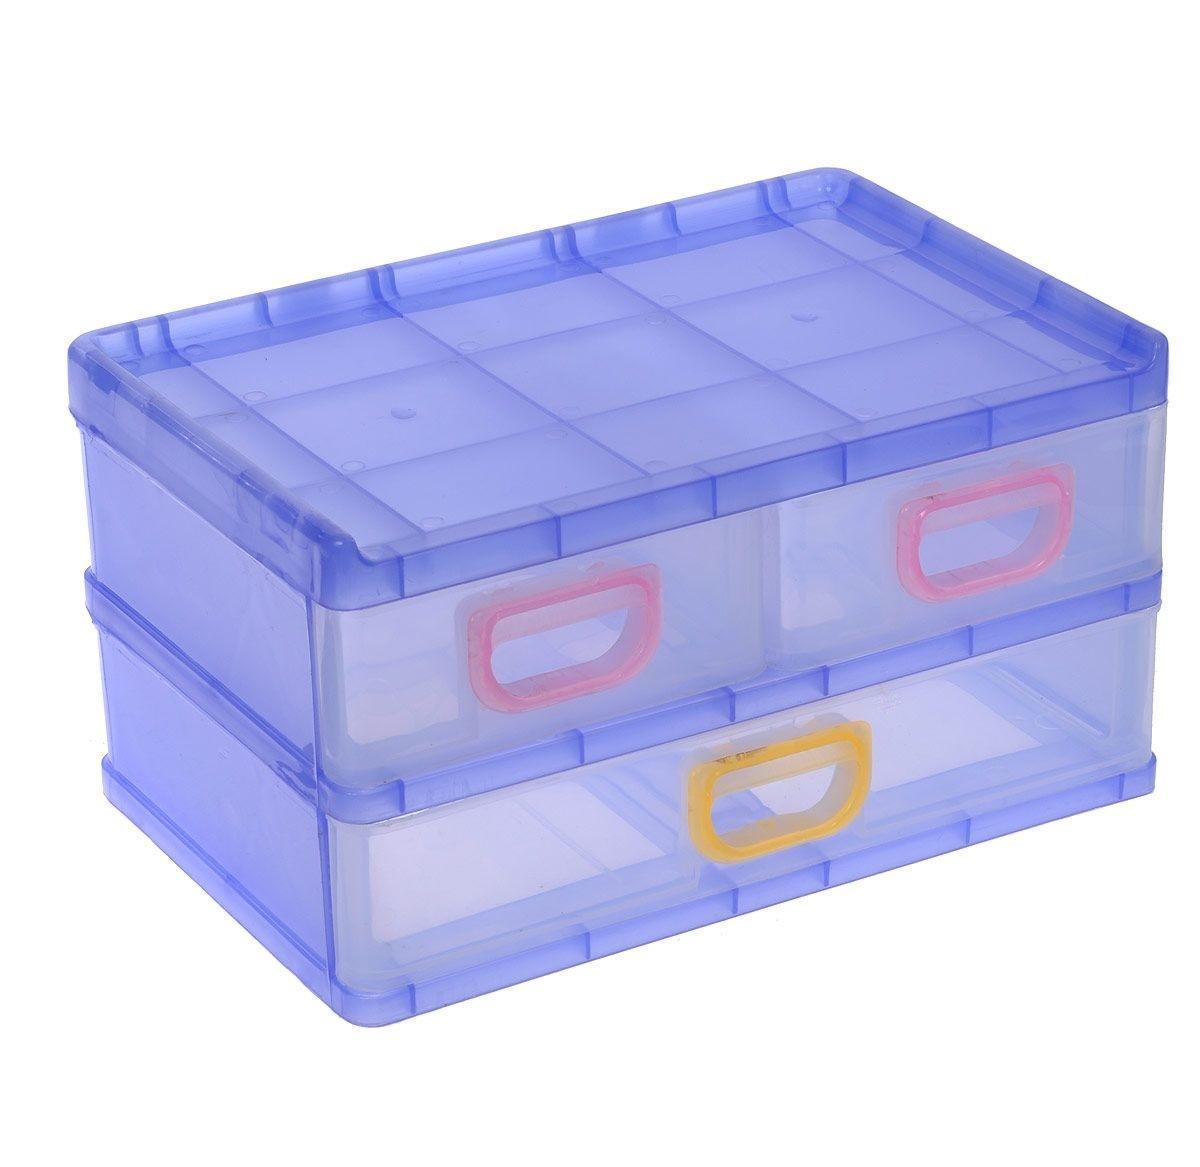 Контейнер для мелочей, цвет: сиреневый, 26 х 17 х 13,5 см 531696